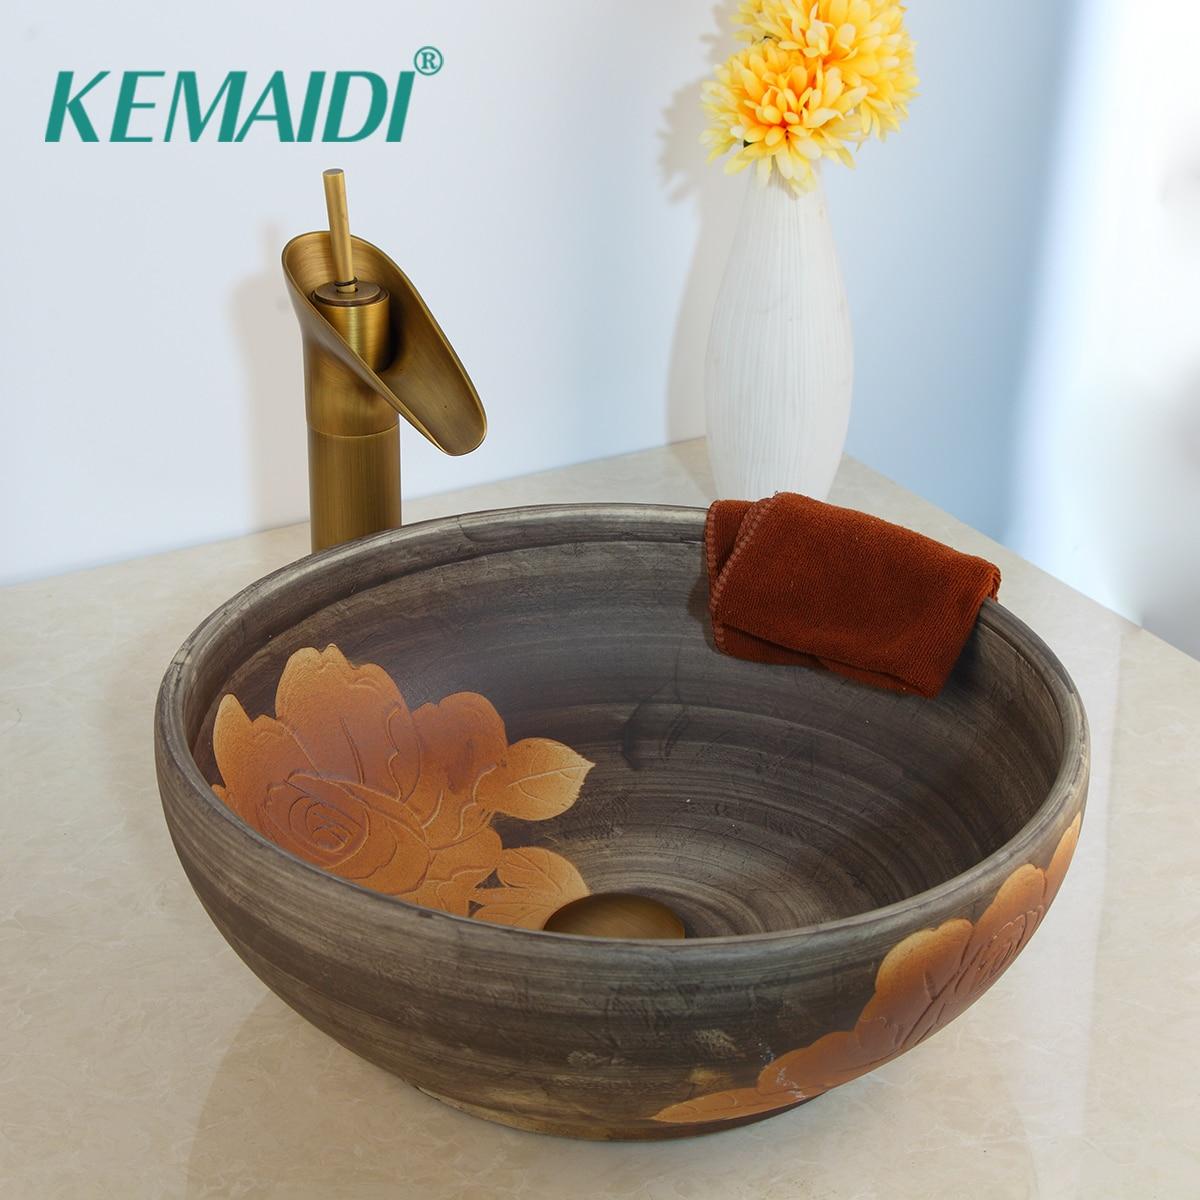 KEMAIDI Solid Brass Tap Luxury Ceramic Lavatory Bathroom Tap Washbasin Basin Sink Set Bath Combine Mixer FaucetKEMAIDI Solid Brass Tap Luxury Ceramic Lavatory Bathroom Tap Washbasin Basin Sink Set Bath Combine Mixer Faucet